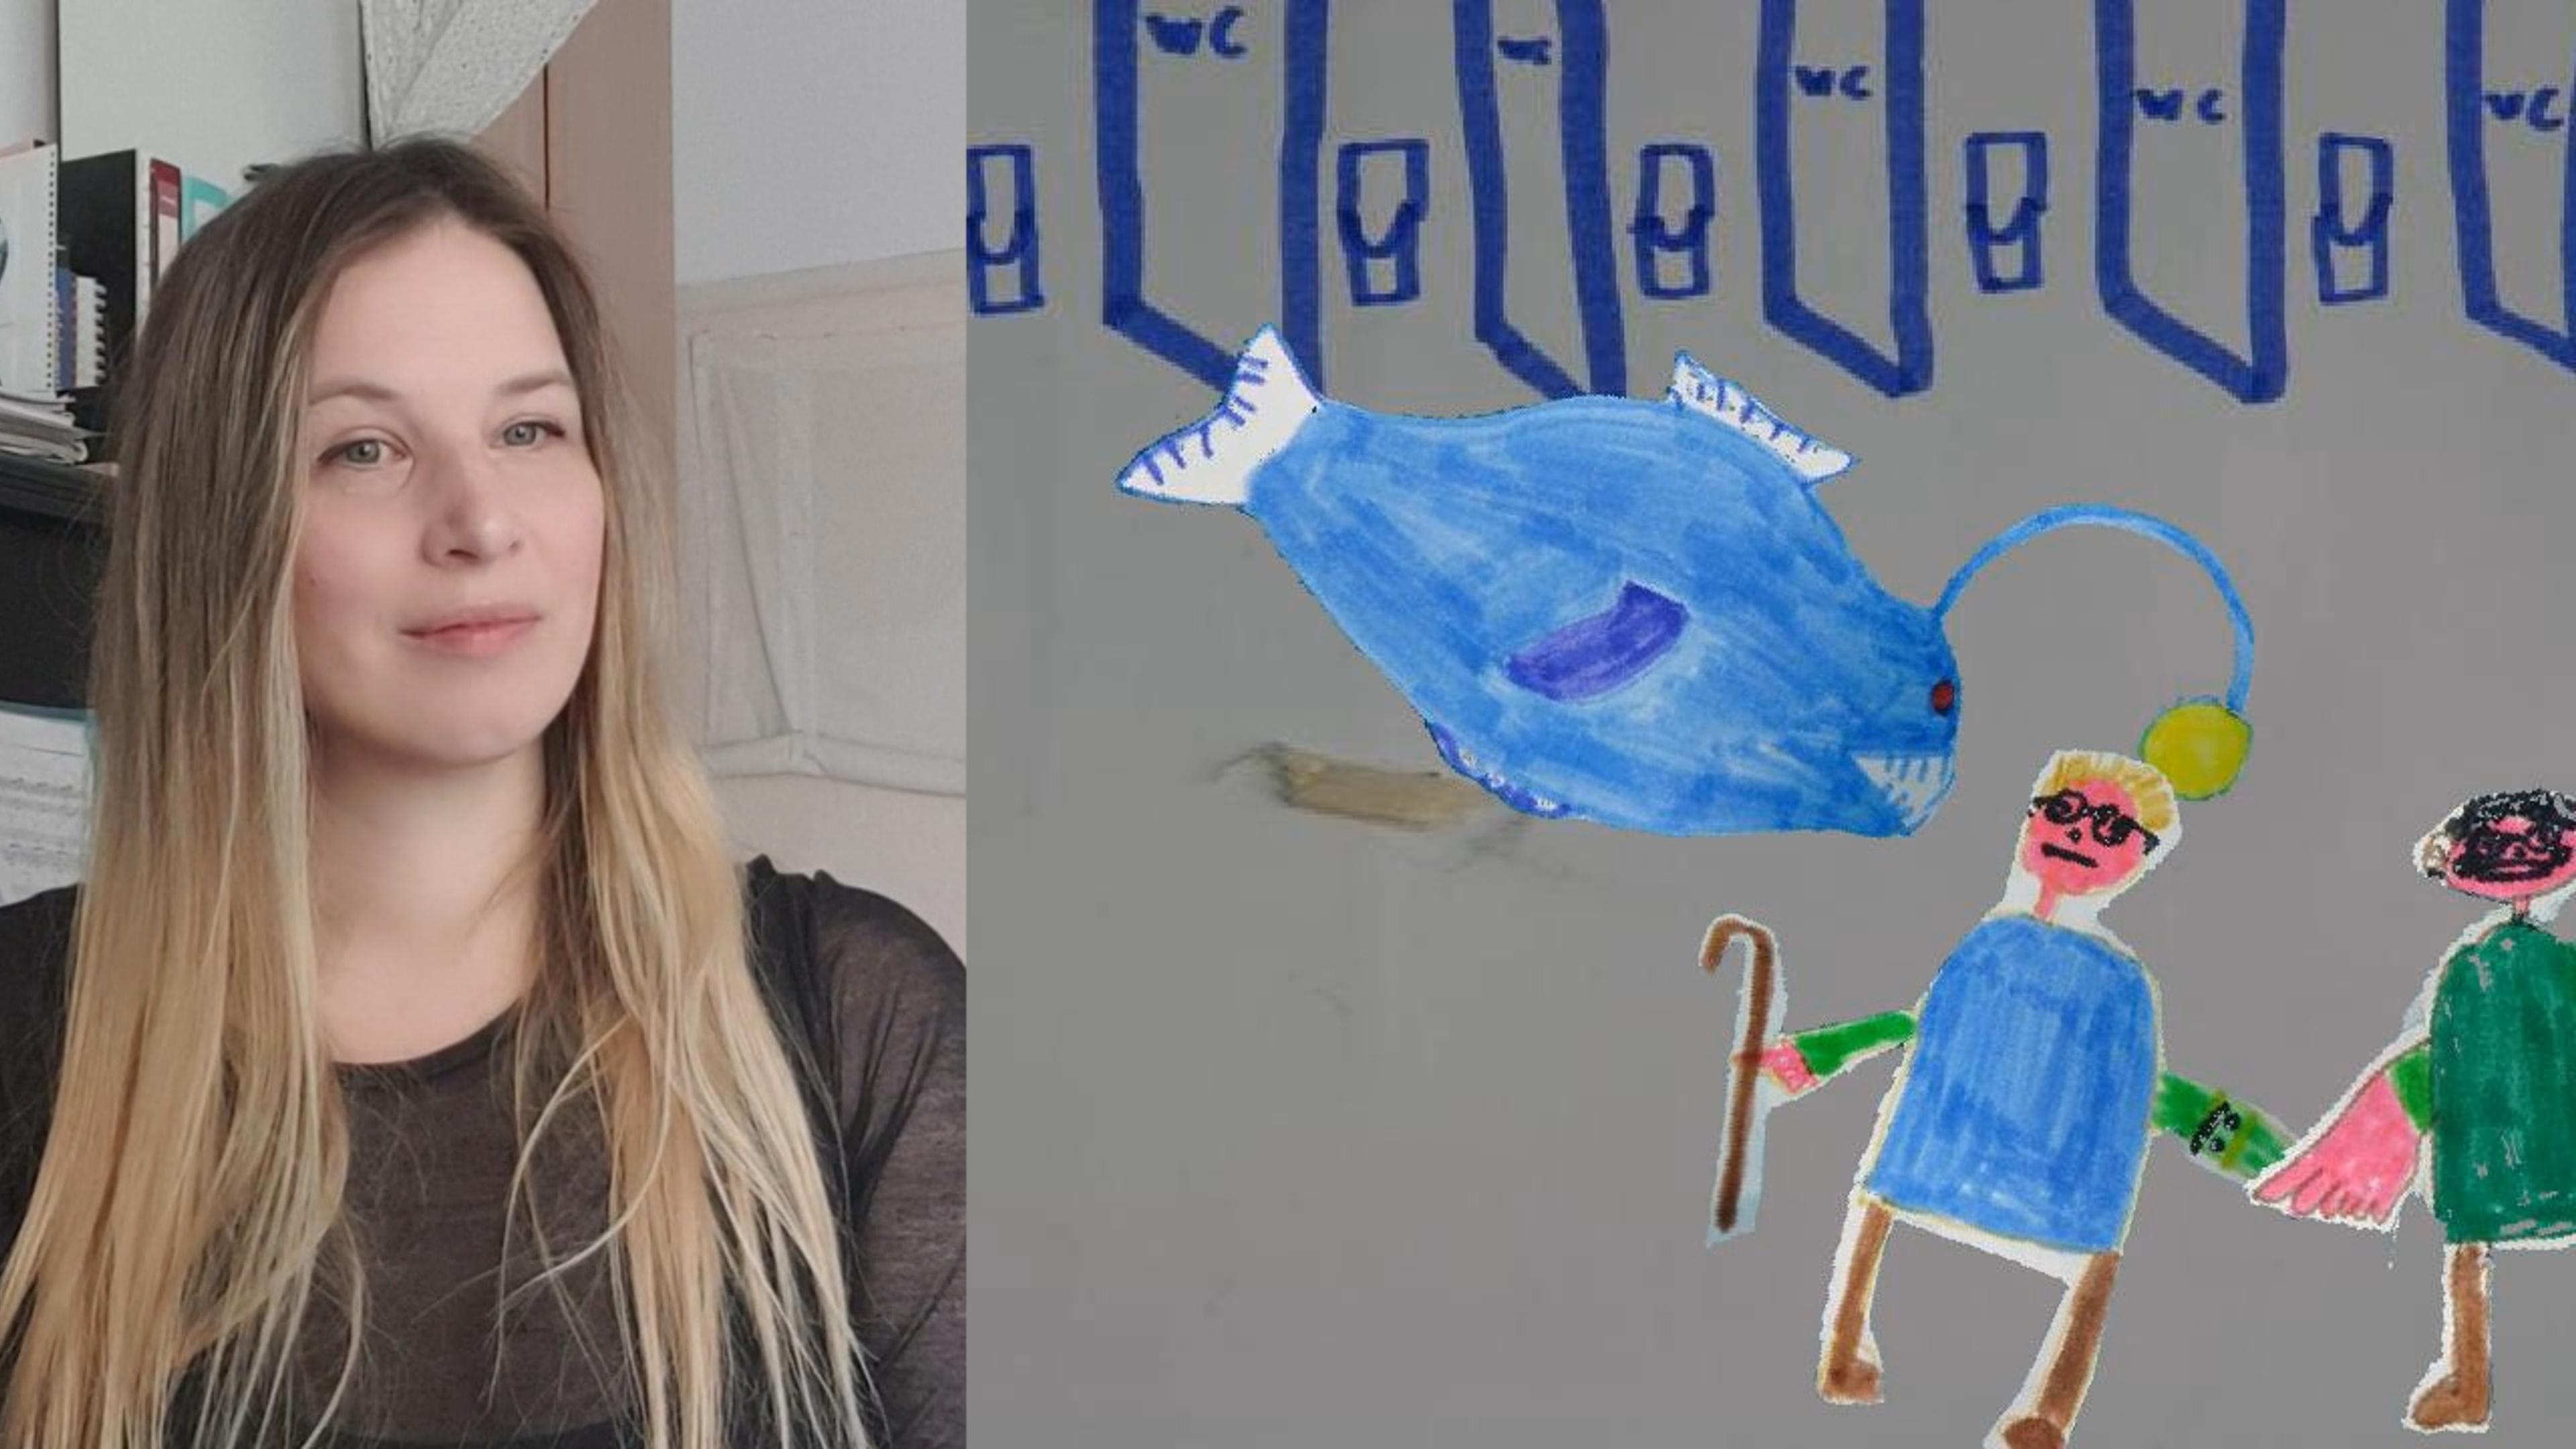 Freundschaft im Zoo präsentiert von Bettina Langegger